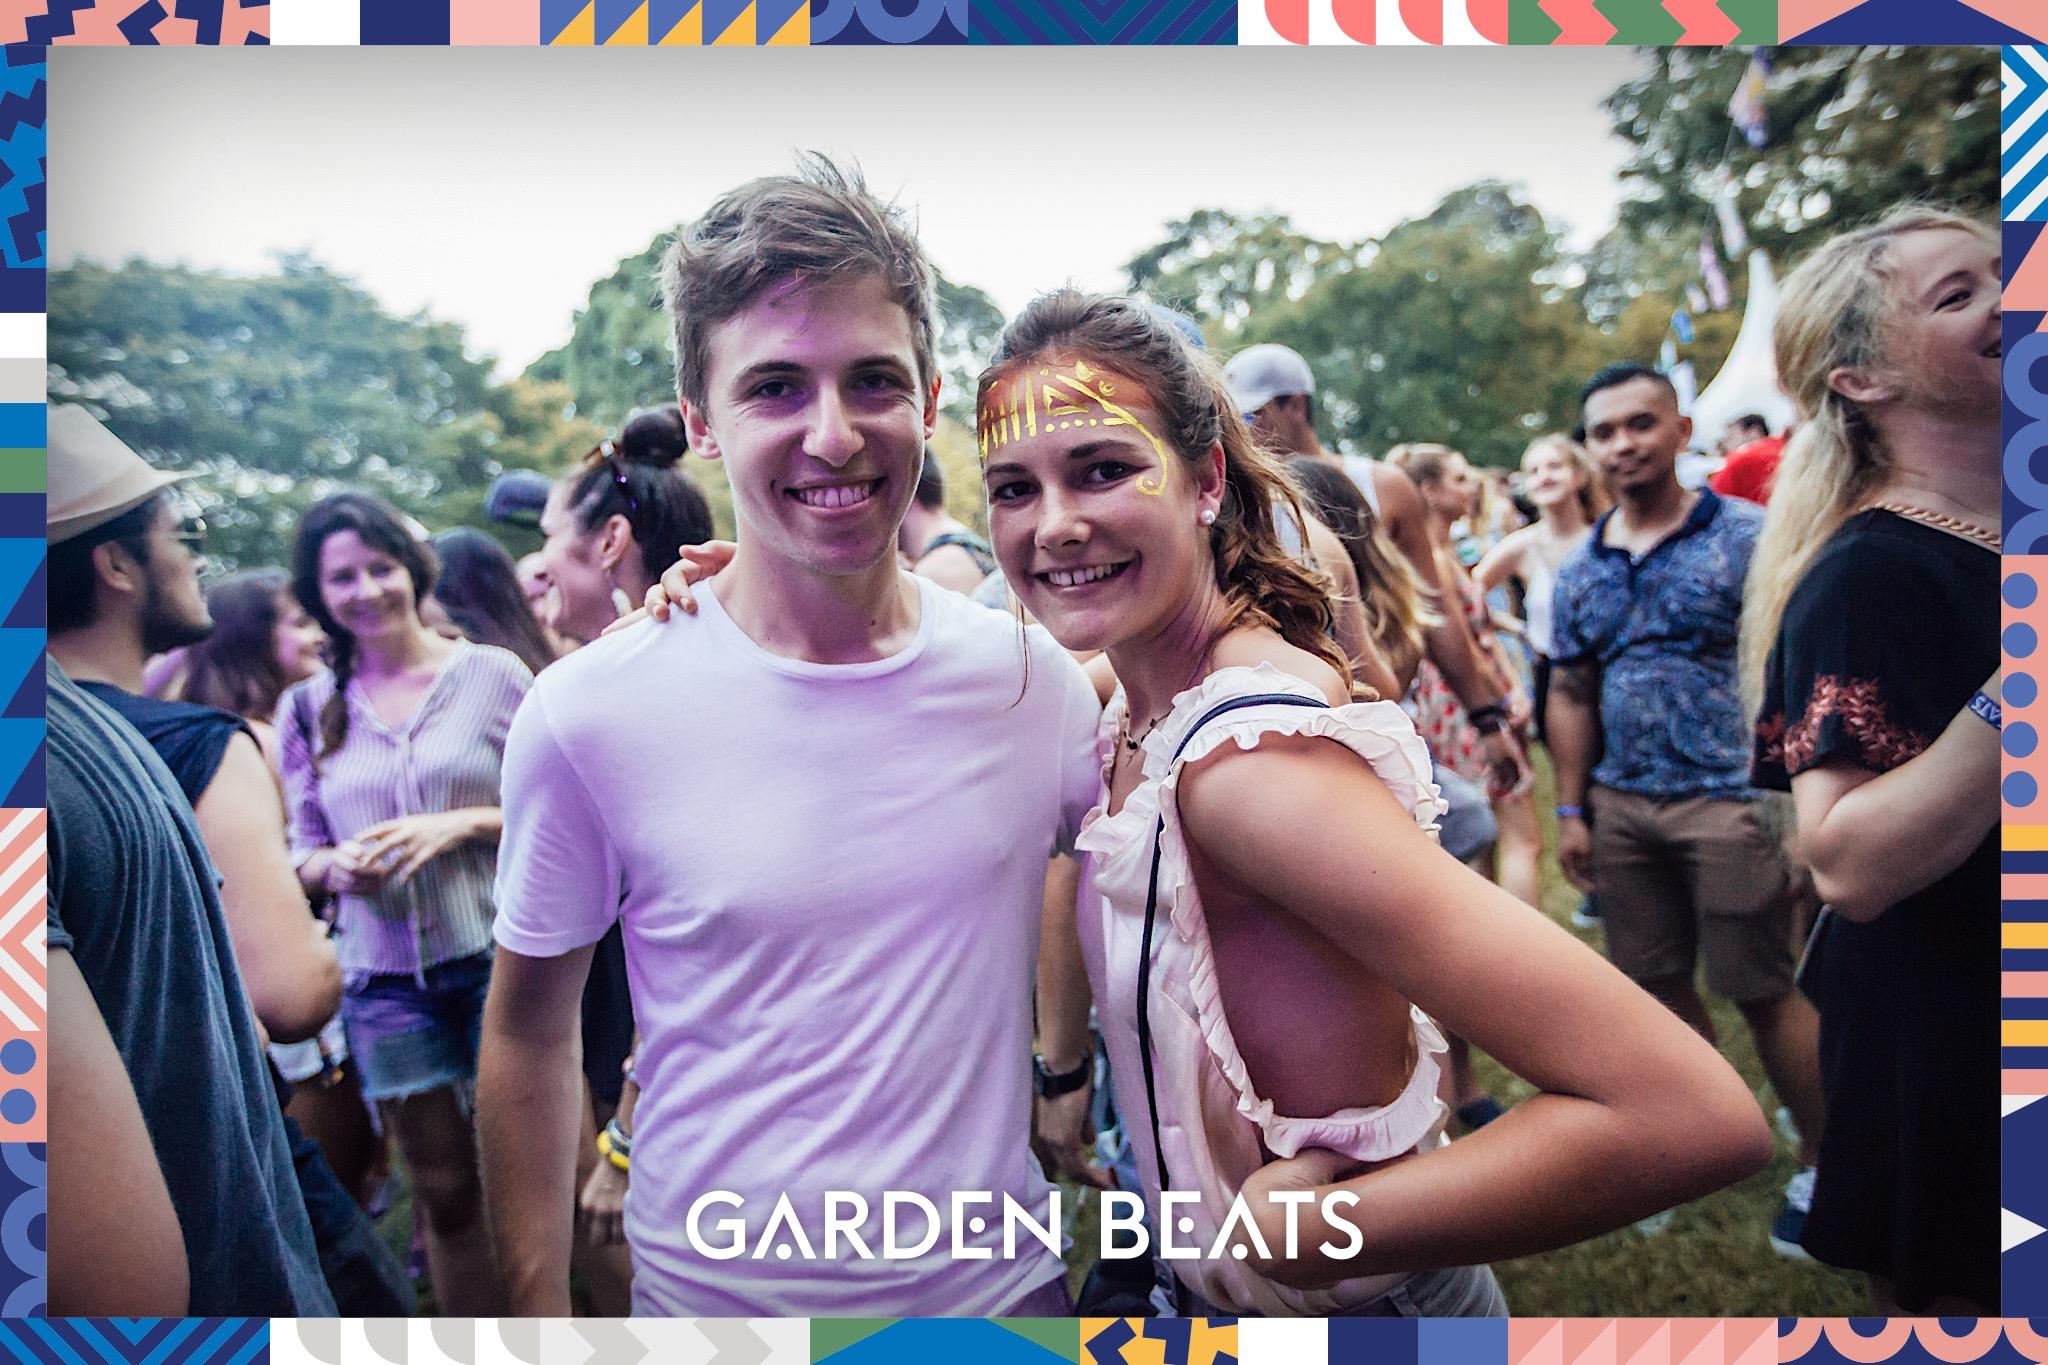 18032017_GardenBeats_Colossal693_WatermarkedGB.jpg